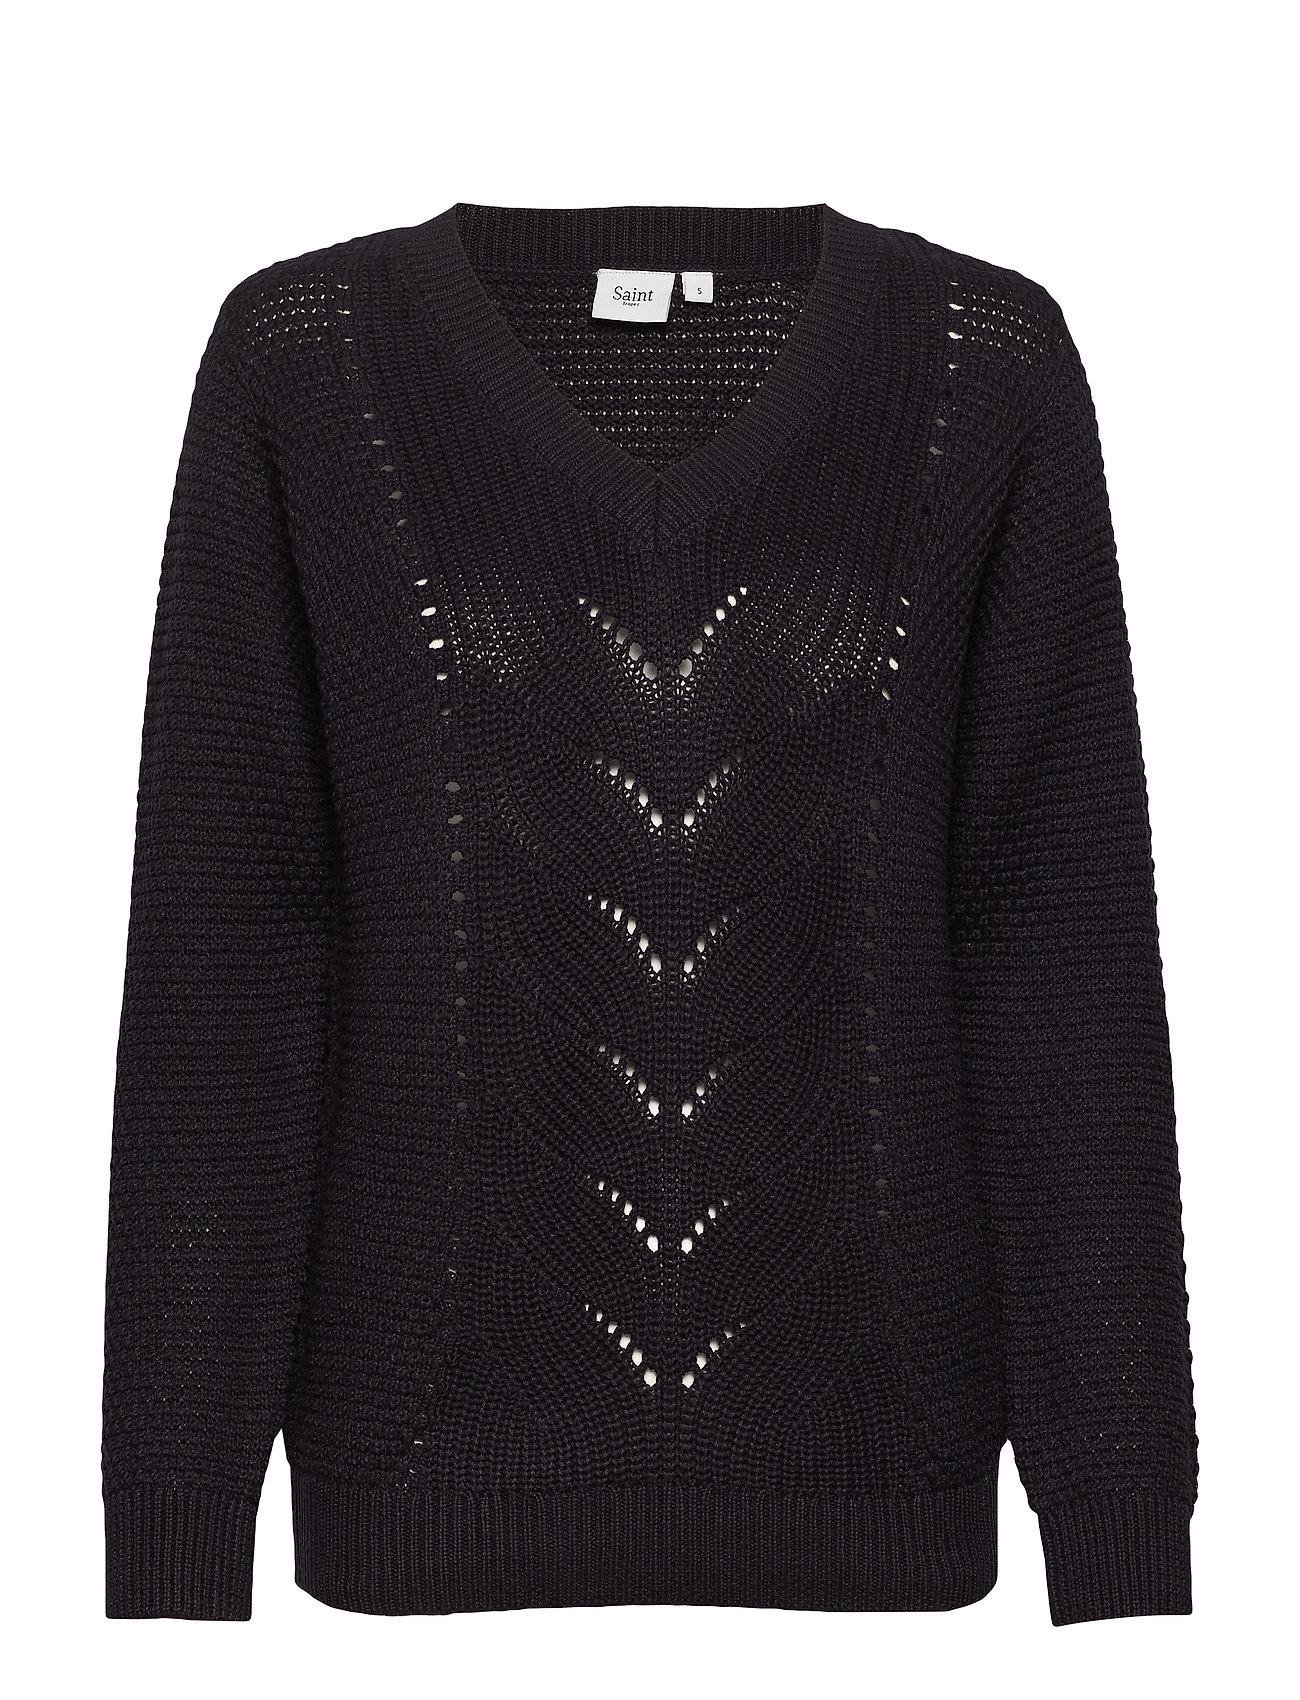 dab321303f0 Pointelle Knit Sweater ponchoer & kapper fra Saint Tropez til dame i ...